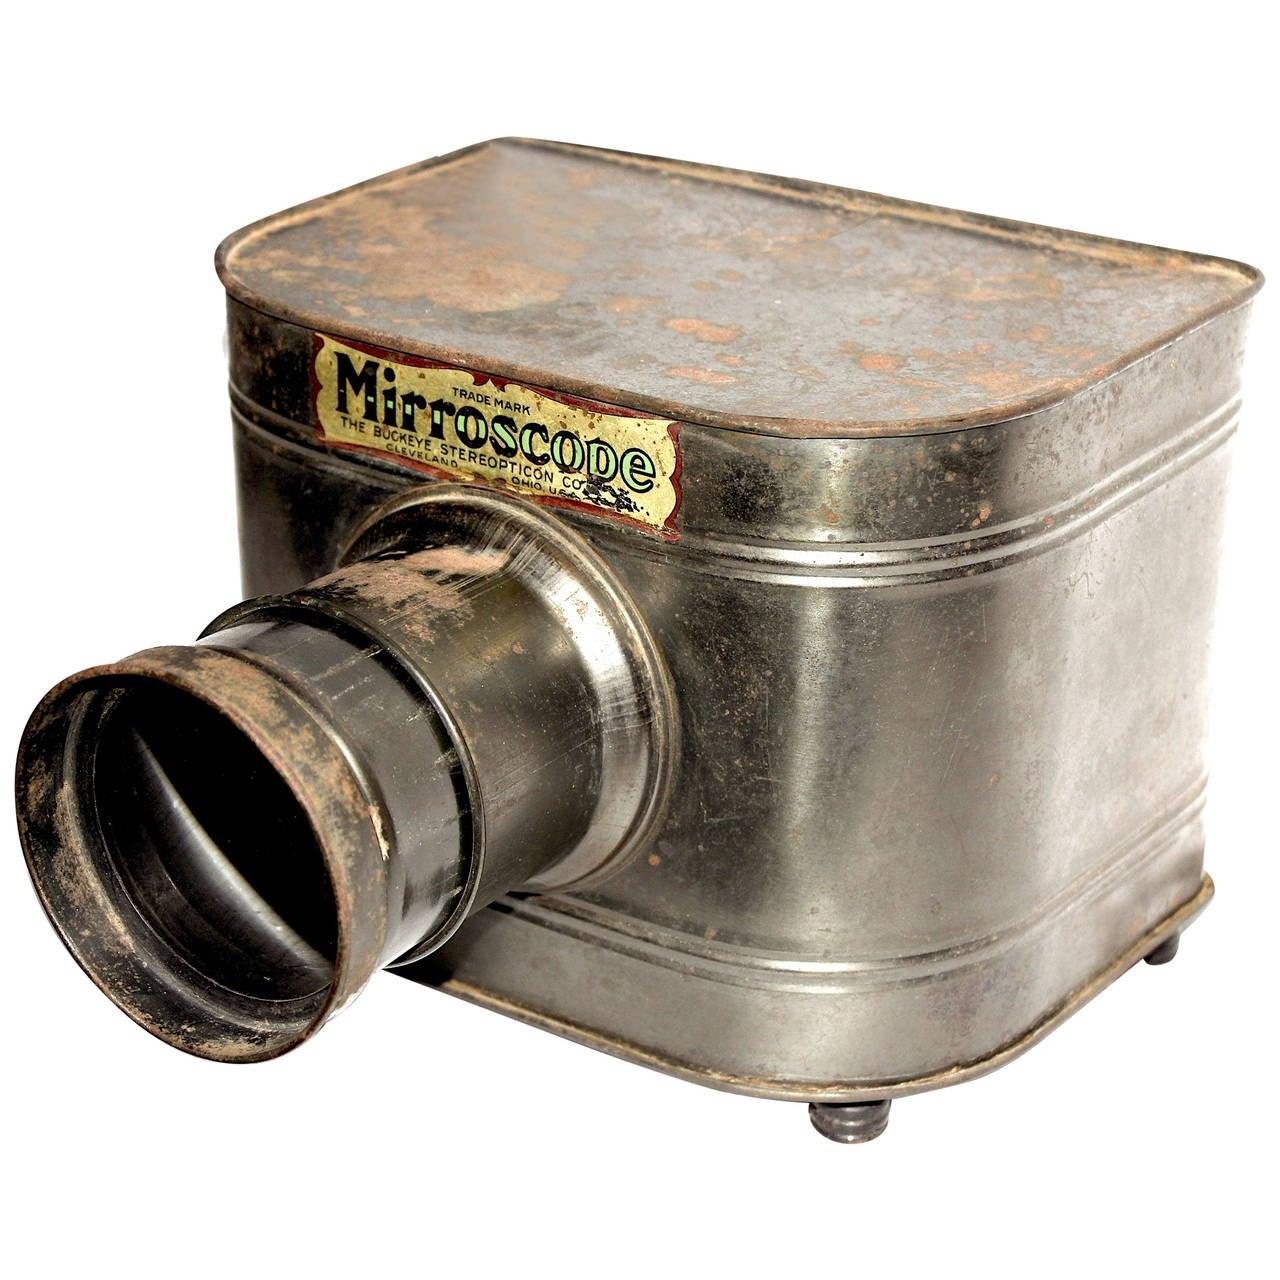 Mirroscope Magic Lantern Opaque Projector Circa 1912 At